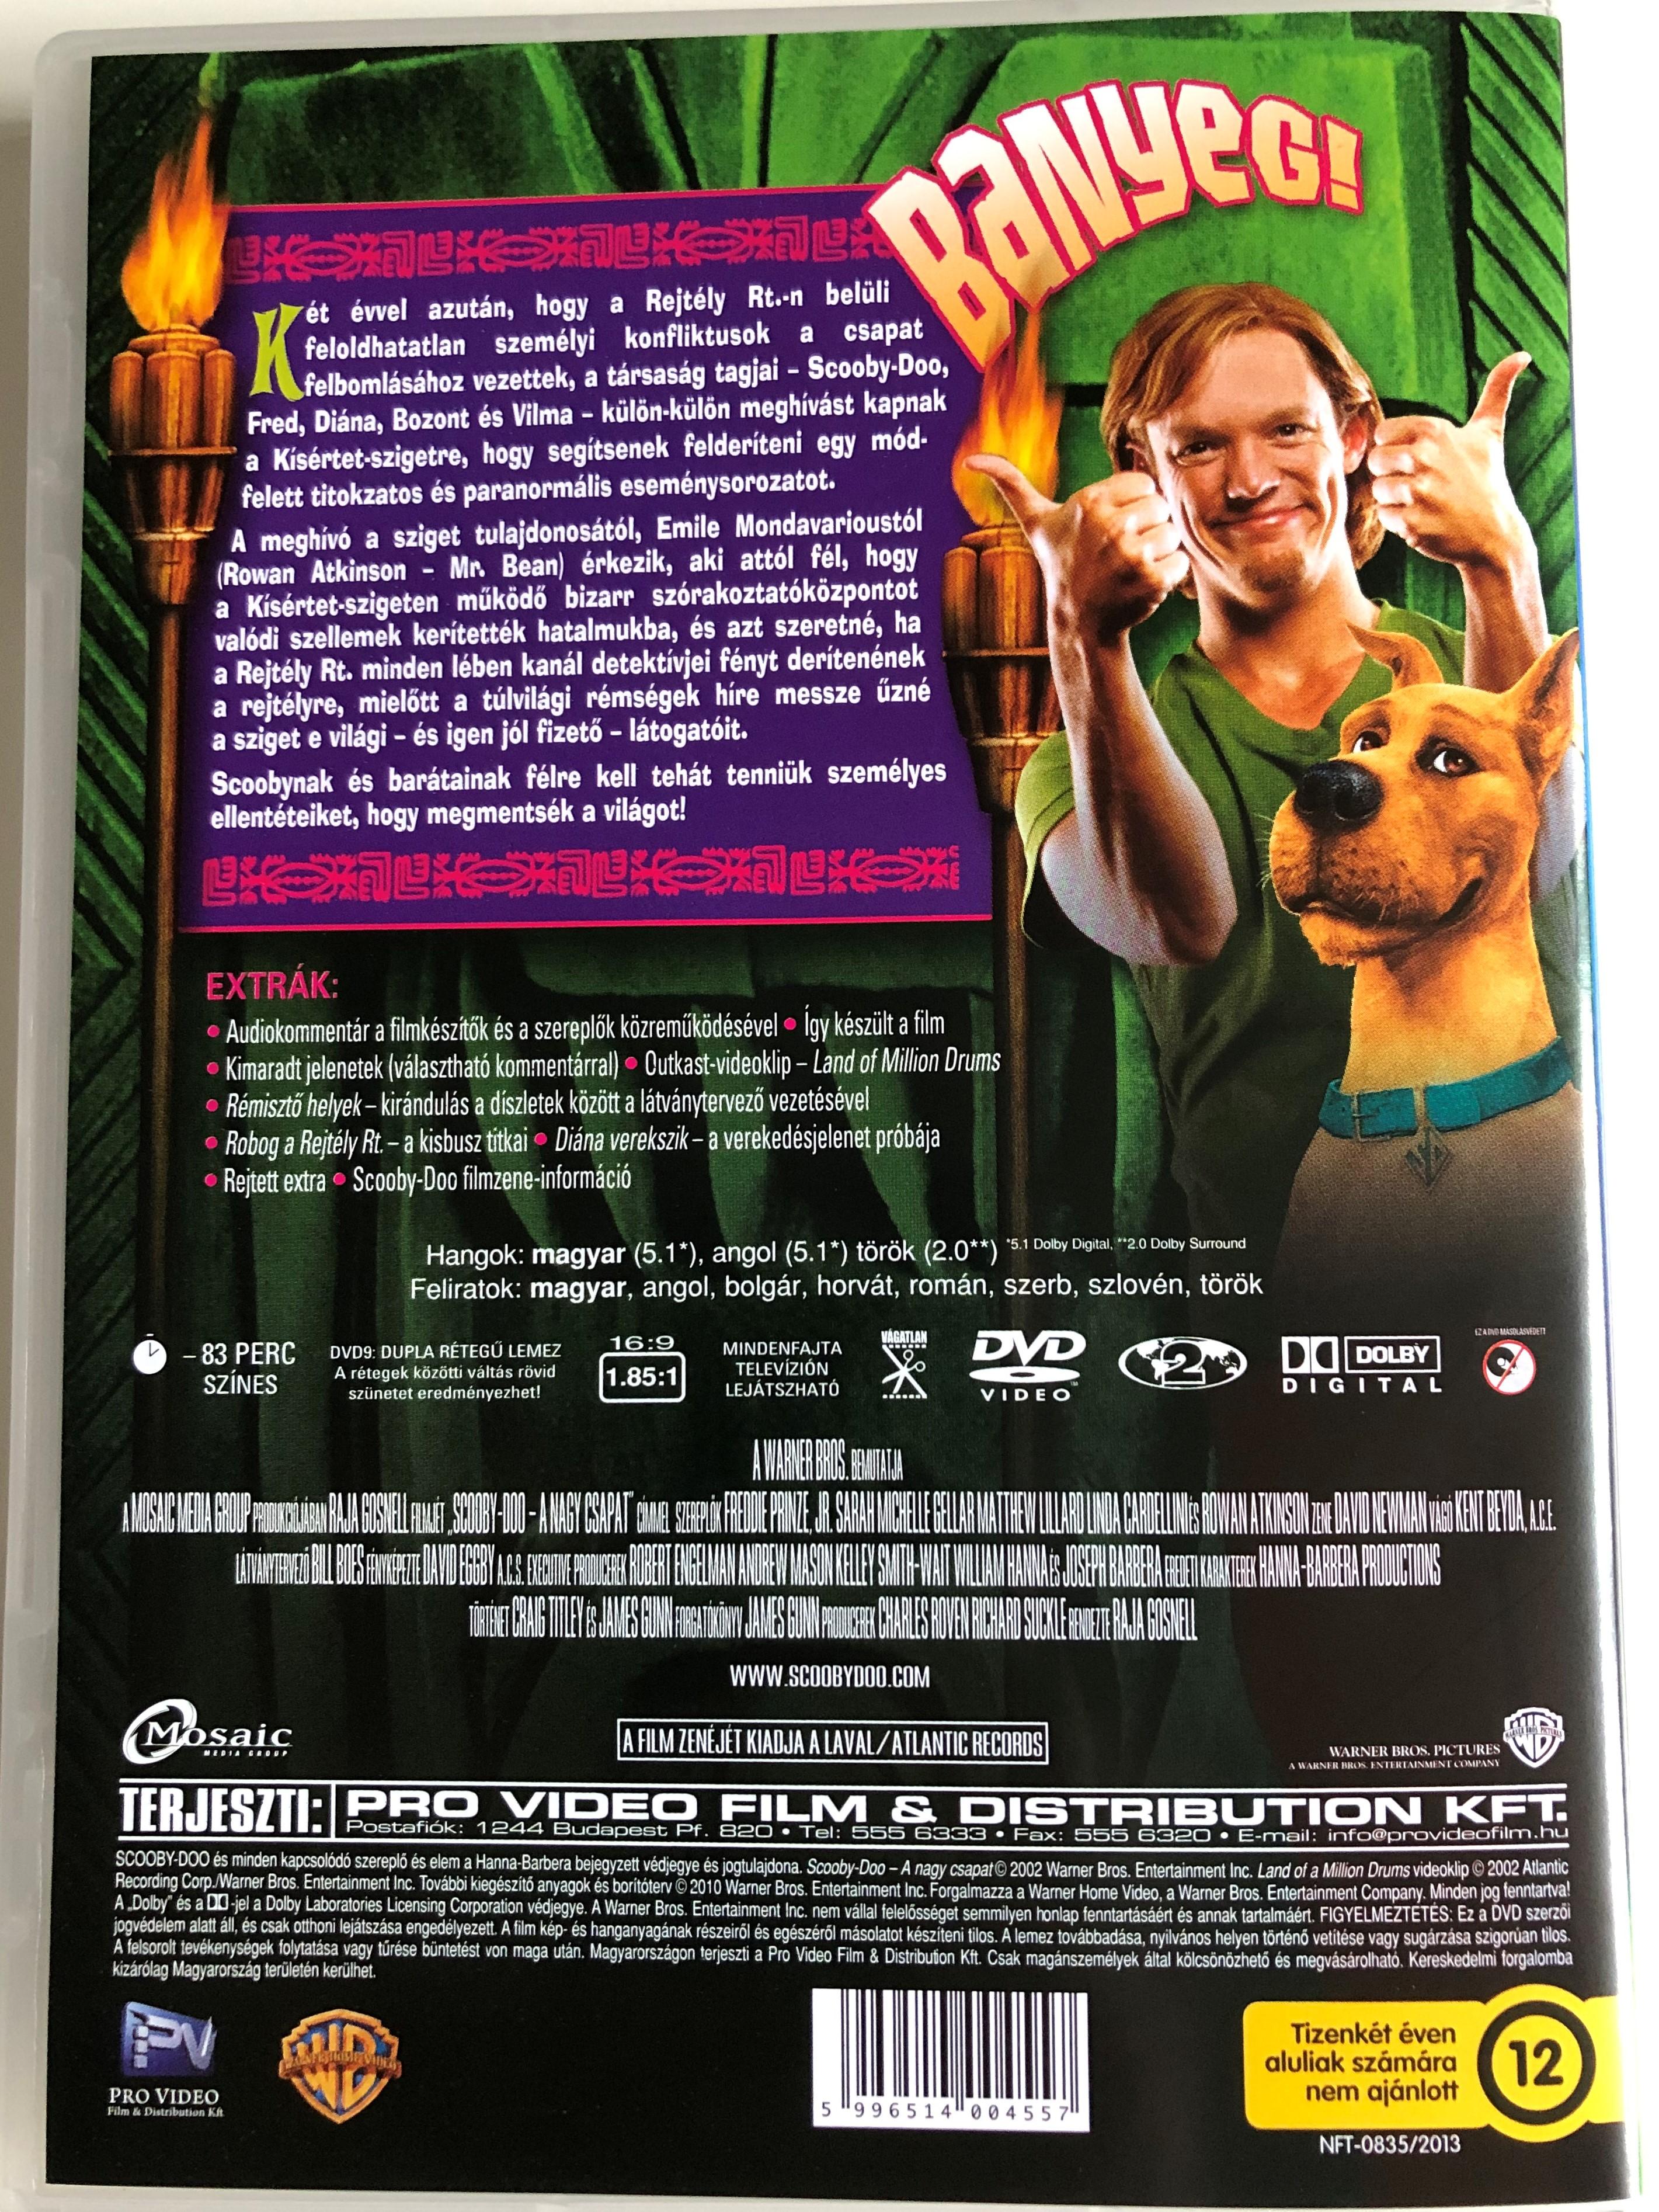 Scooby Doo Dvd 2002 Scooby Doo A Nagy Csapat Directed By Raja Gosnell Starring Freddie Prinze Jr Sarah Michelle Gellar Matthew Lillard Linda Cardellini Rowan Atkinson Bibleinmylanguage